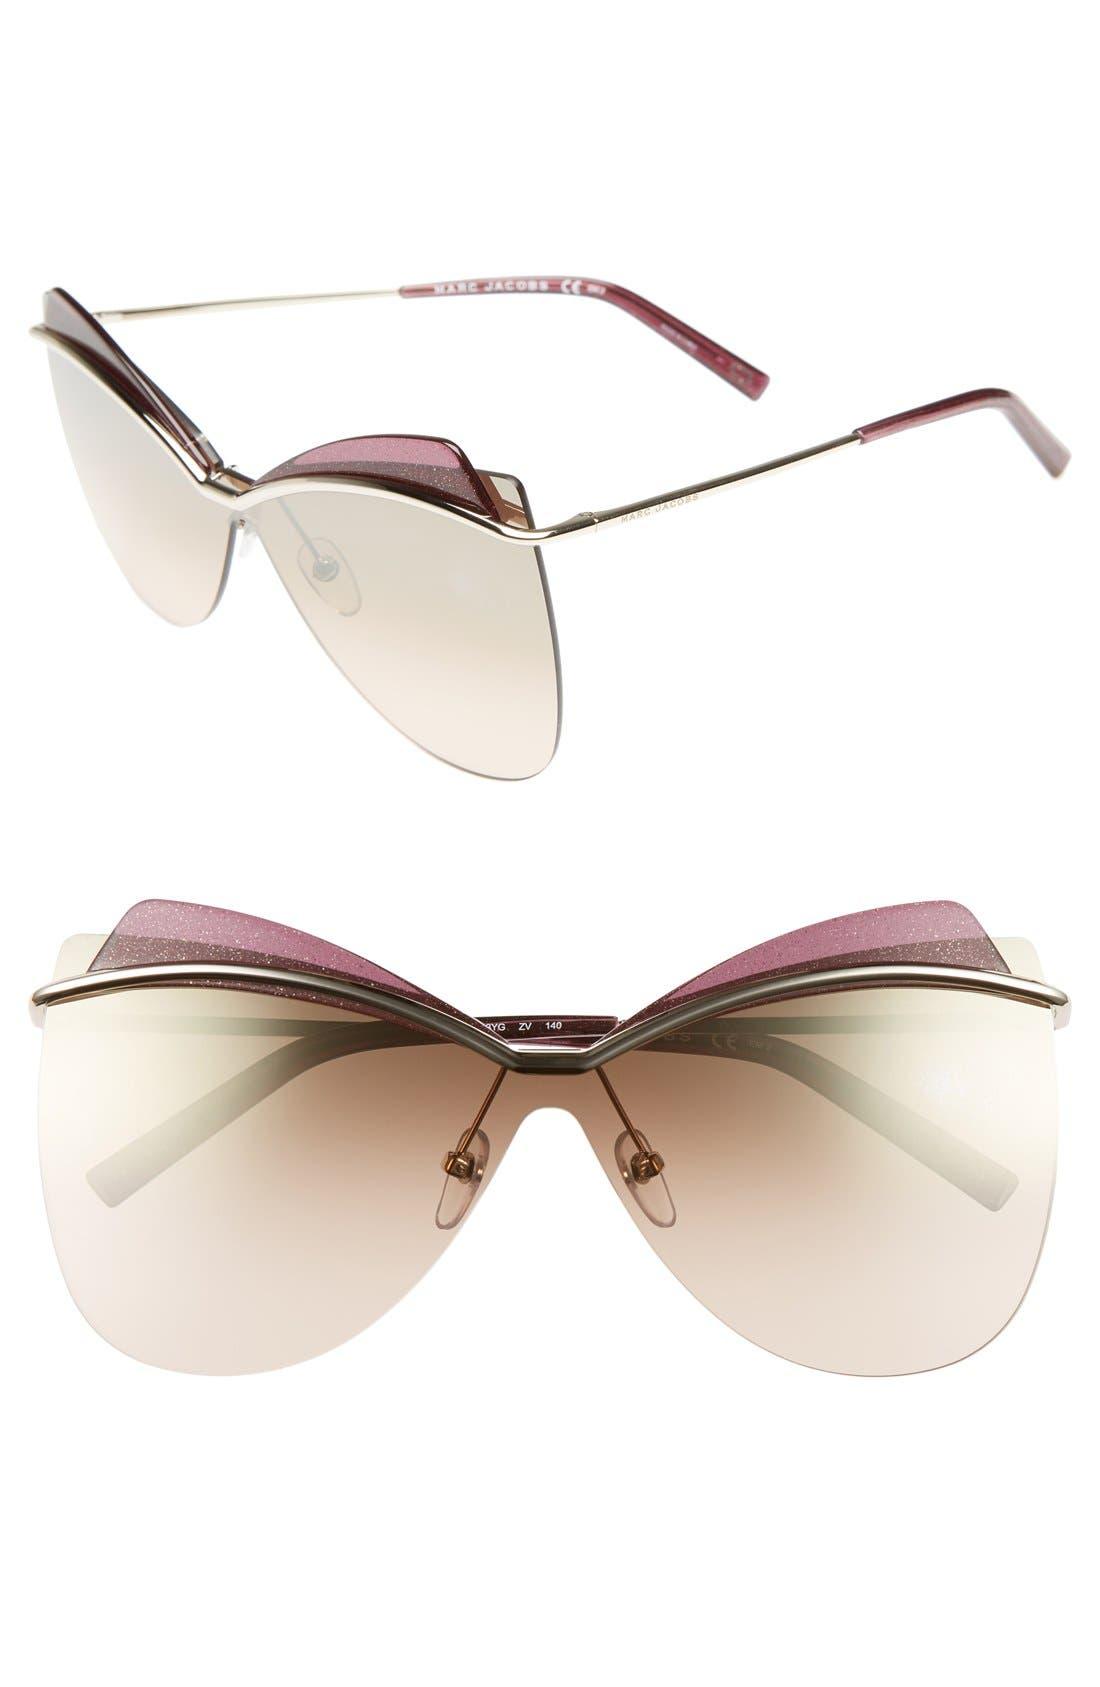 MARC JACOBS 67mm Sunglasses